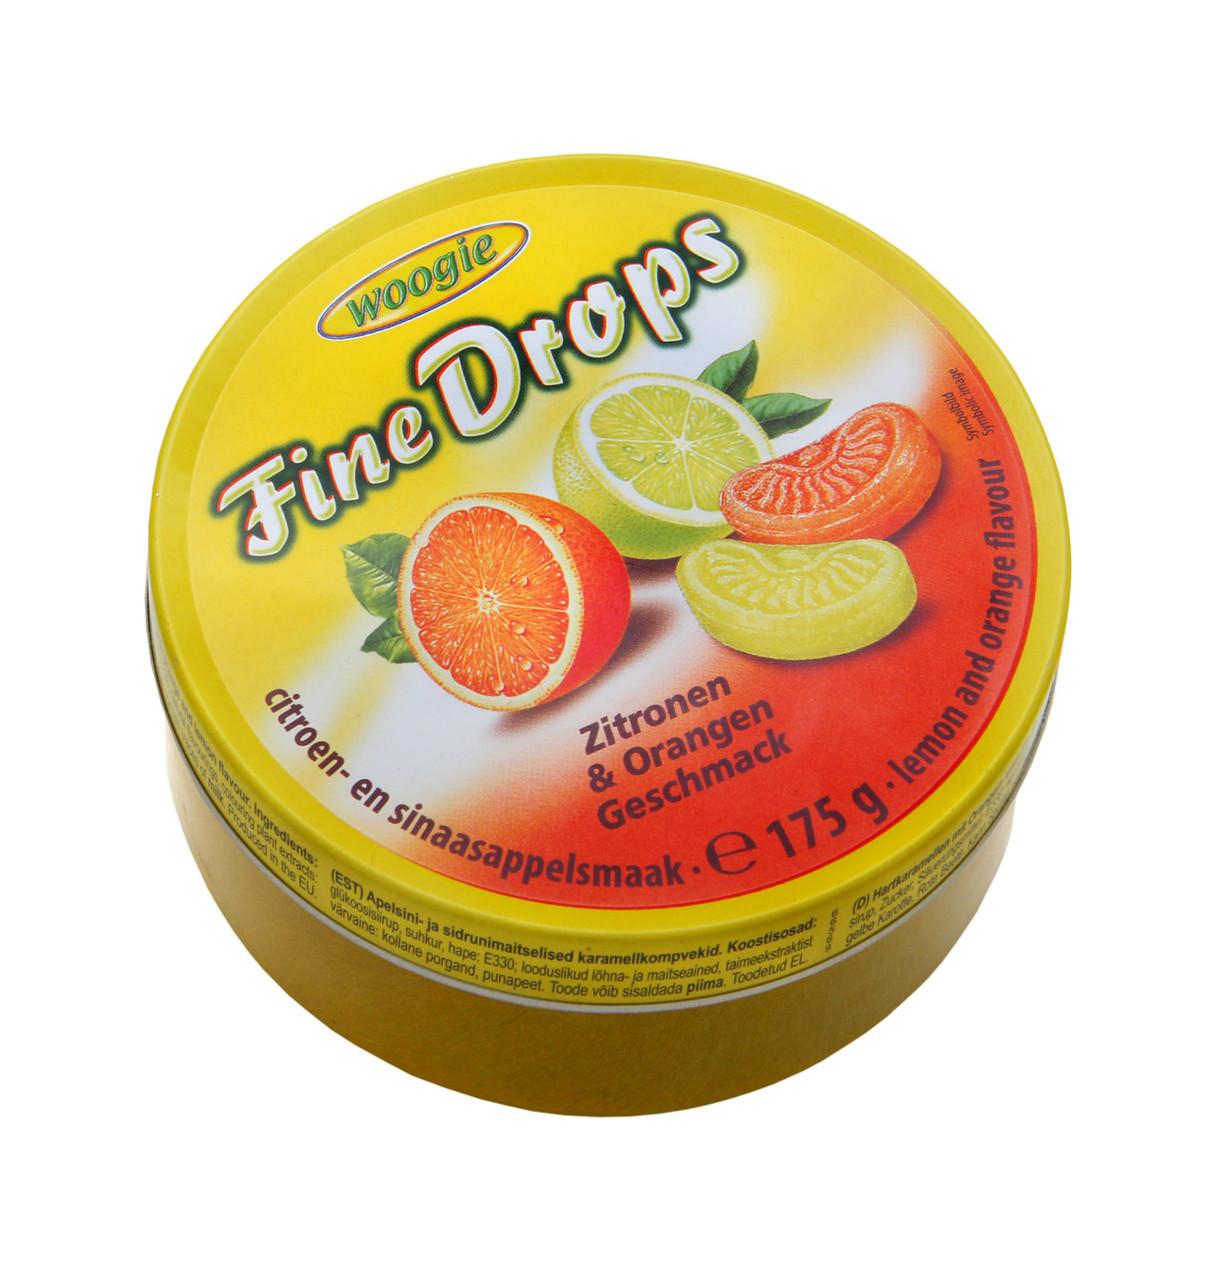 Леденцы Woogie Fine Drops лимон и апельсин 175 g